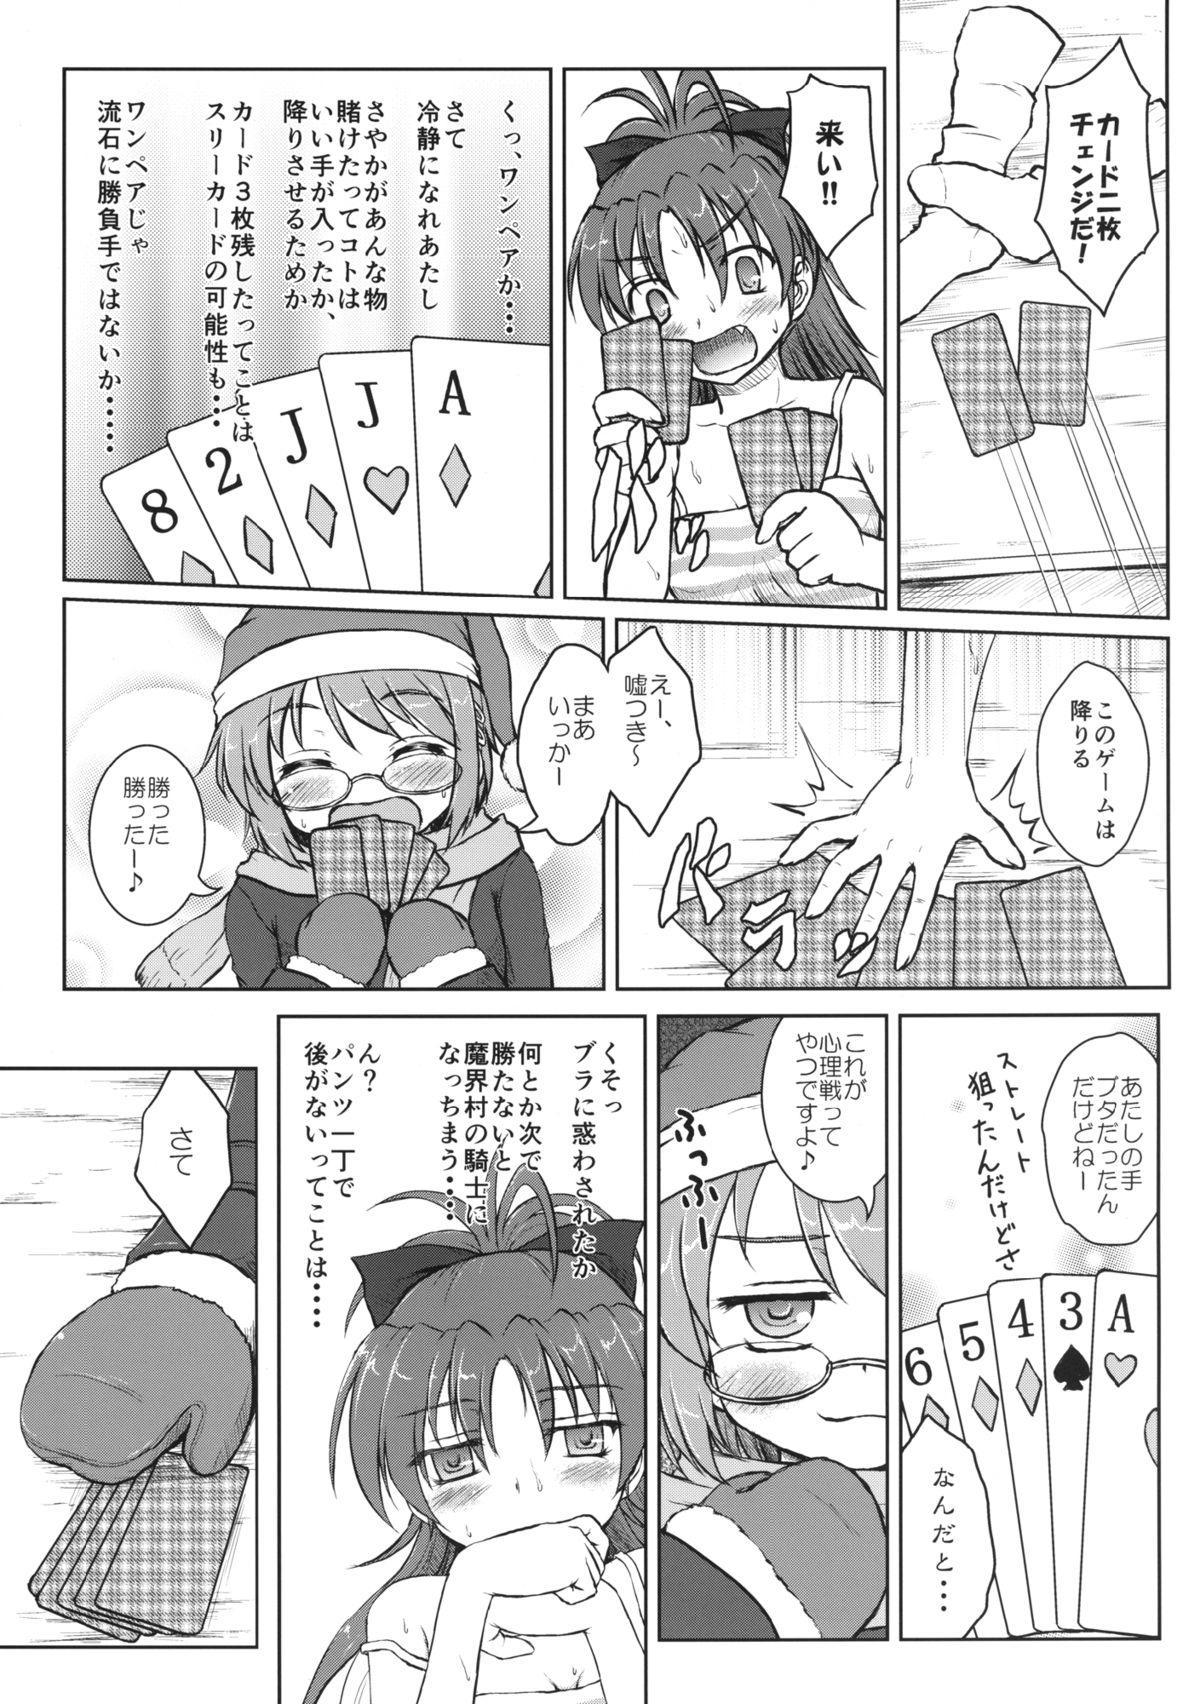 (SHT2013 Haru) [Newtype Kenkyuujo (Kotowari)] Sayaka-san to Kyouko-san (Puella Magi Madoka Magica) 12